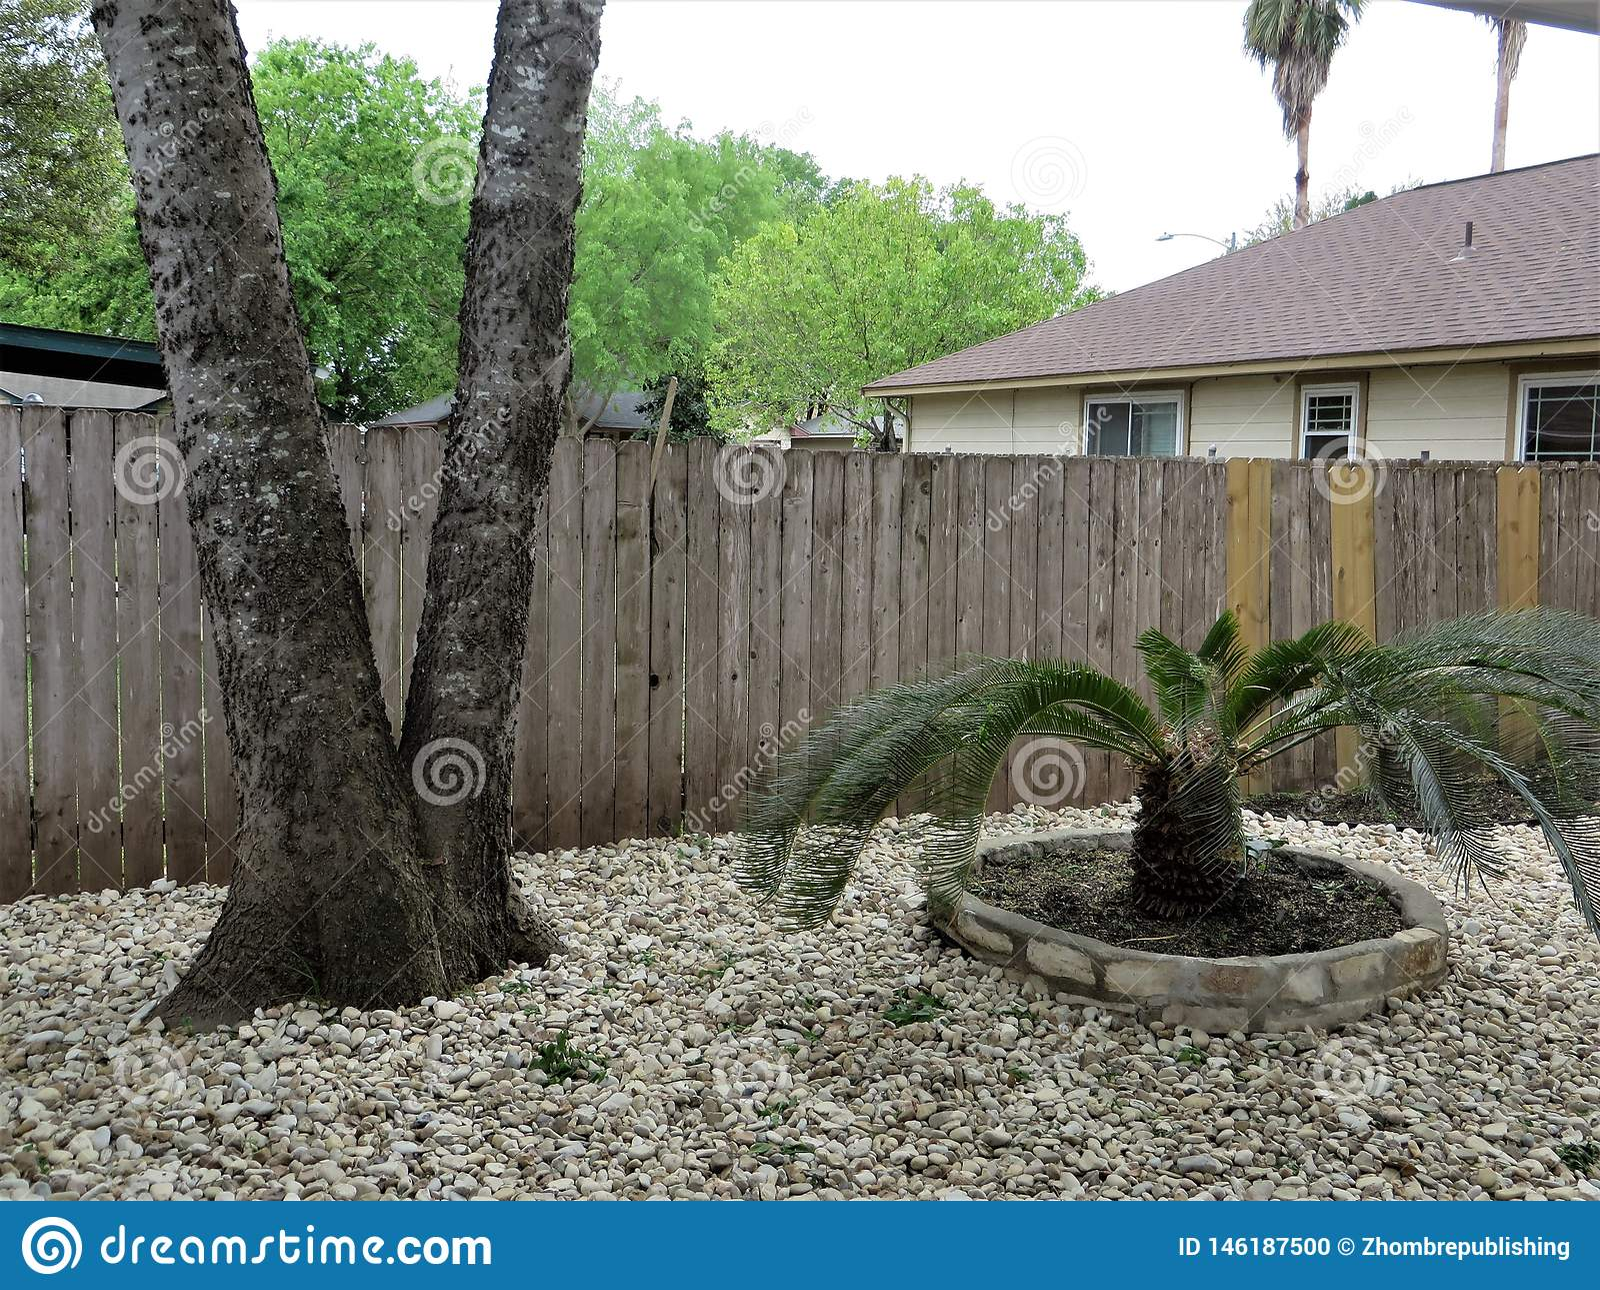 Xeriscape Yard Austin Texas Stock Photo Image Of Landscape Yard 146187500